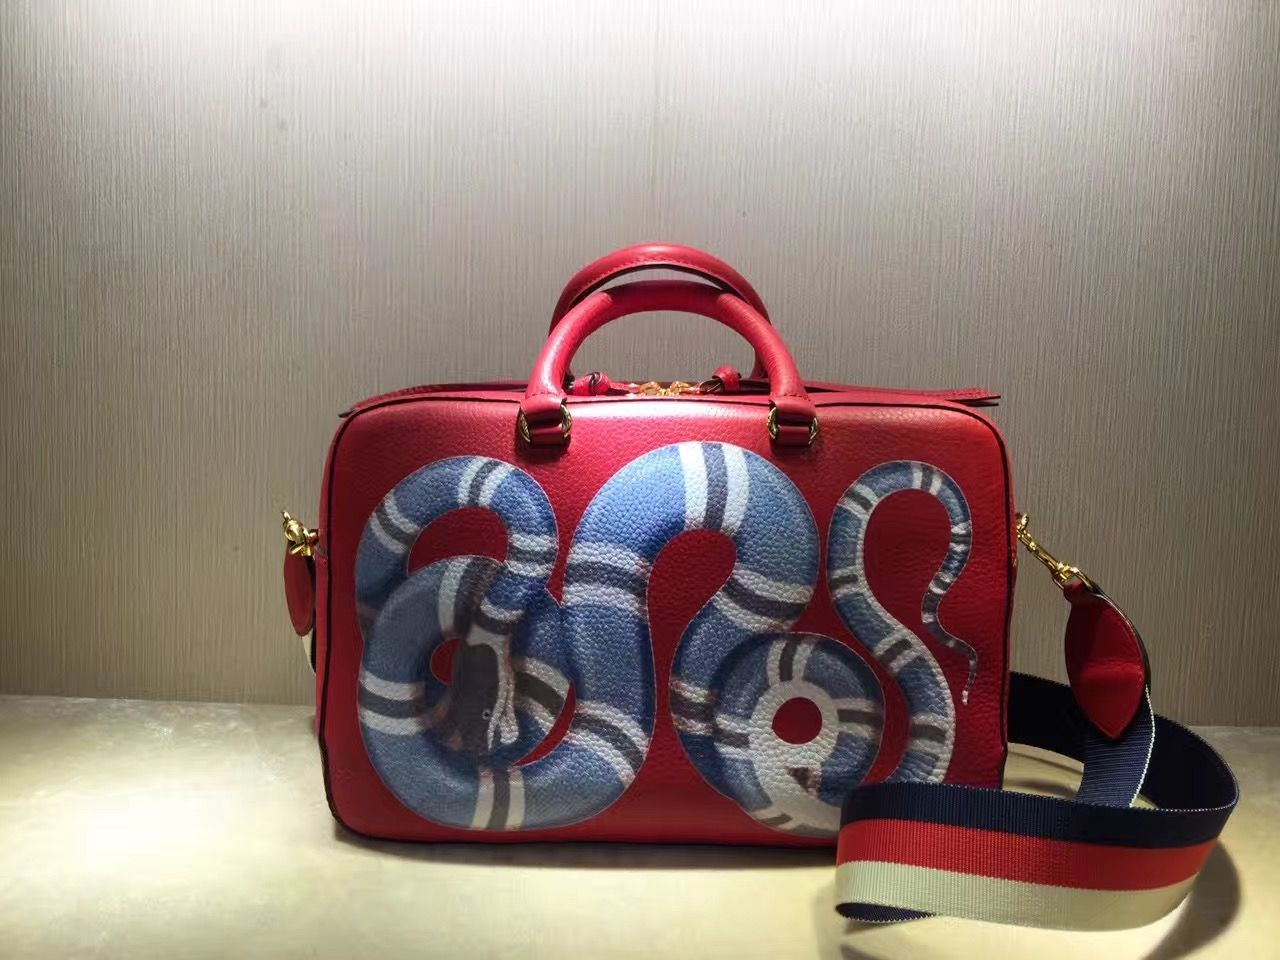 b8d444775eb901 Gucci Snake Print Leather Top Handle Medium Bag 453564 Red 2016 ...